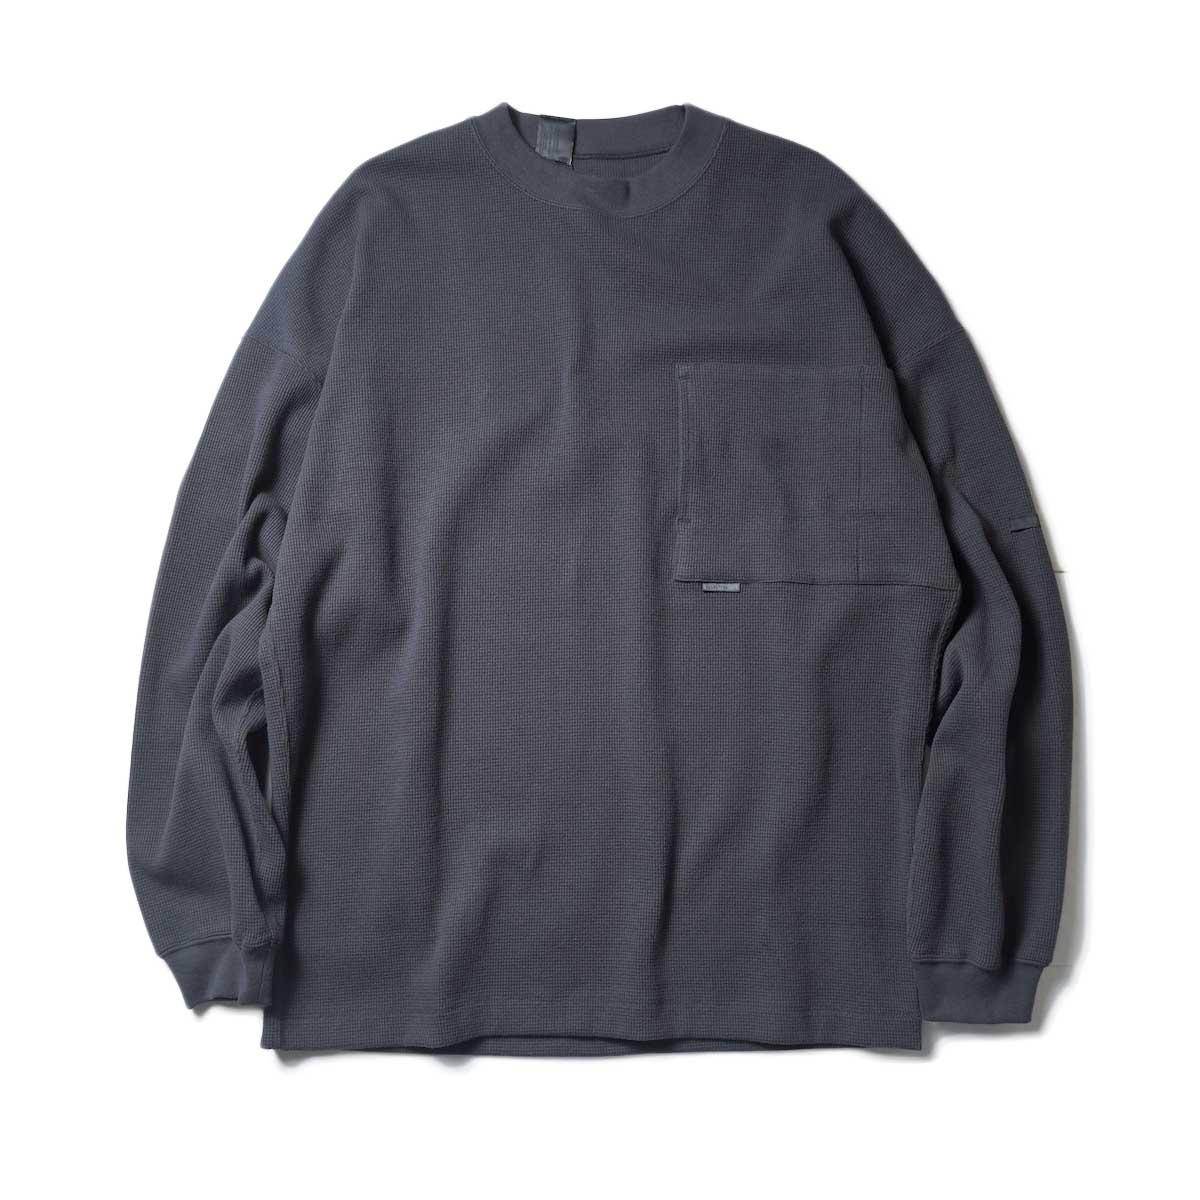 N.HOOLYWOOD / LONG SLEEVE T-SHIRT (Charcoal)